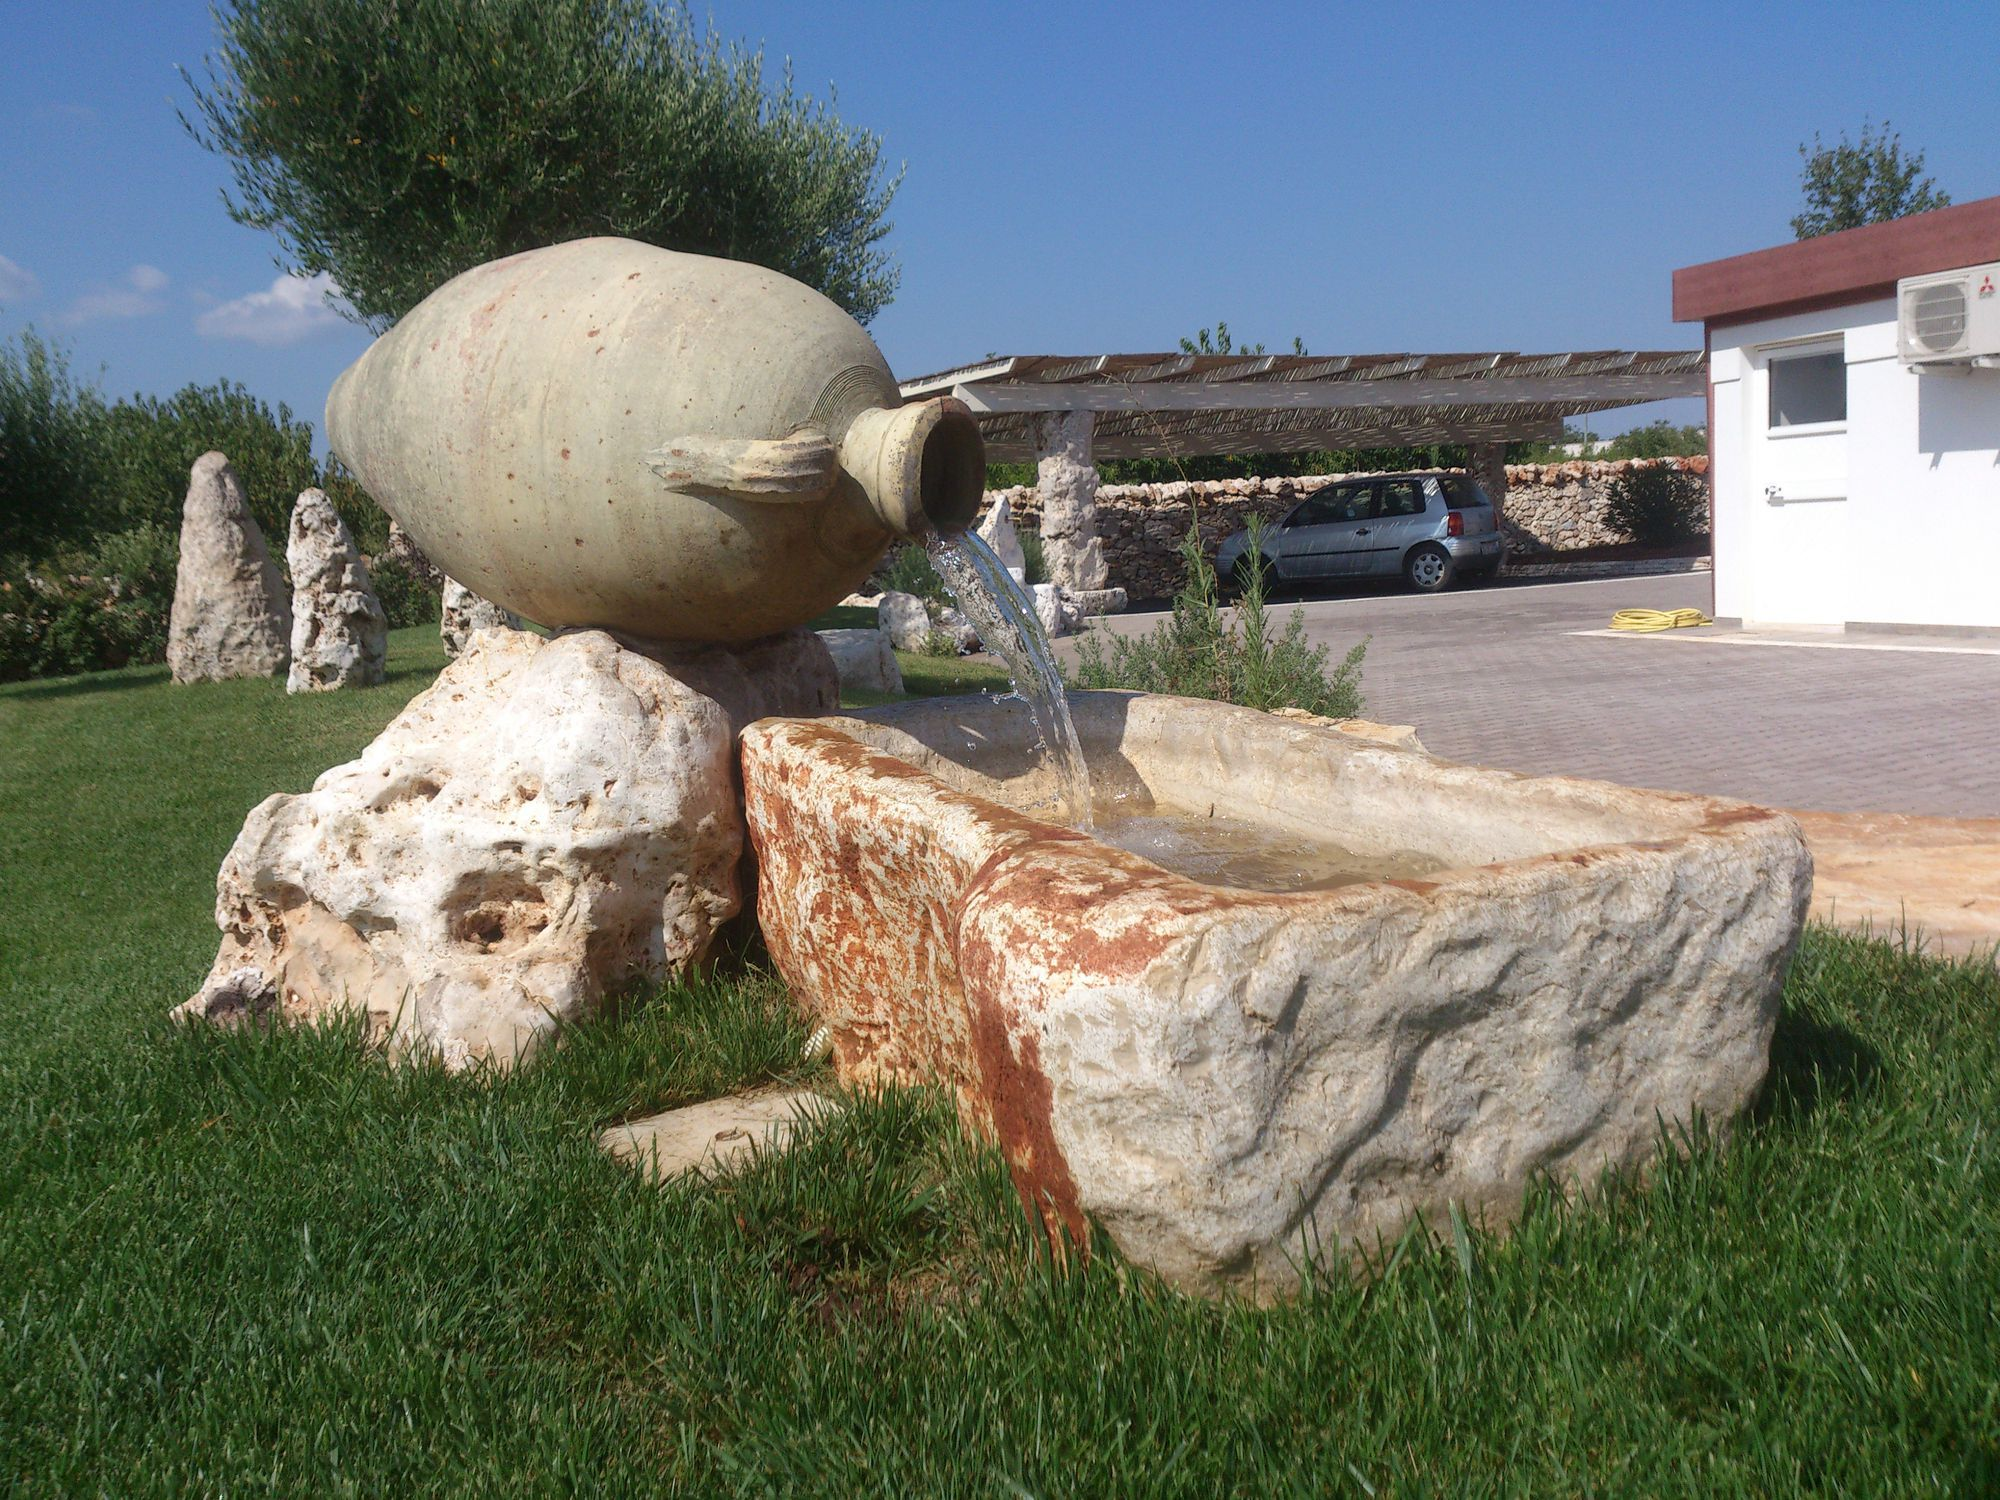 Fontana Giardino Pietra : Fontana da giardino pubblica in pietra naturale un mondo in pietra